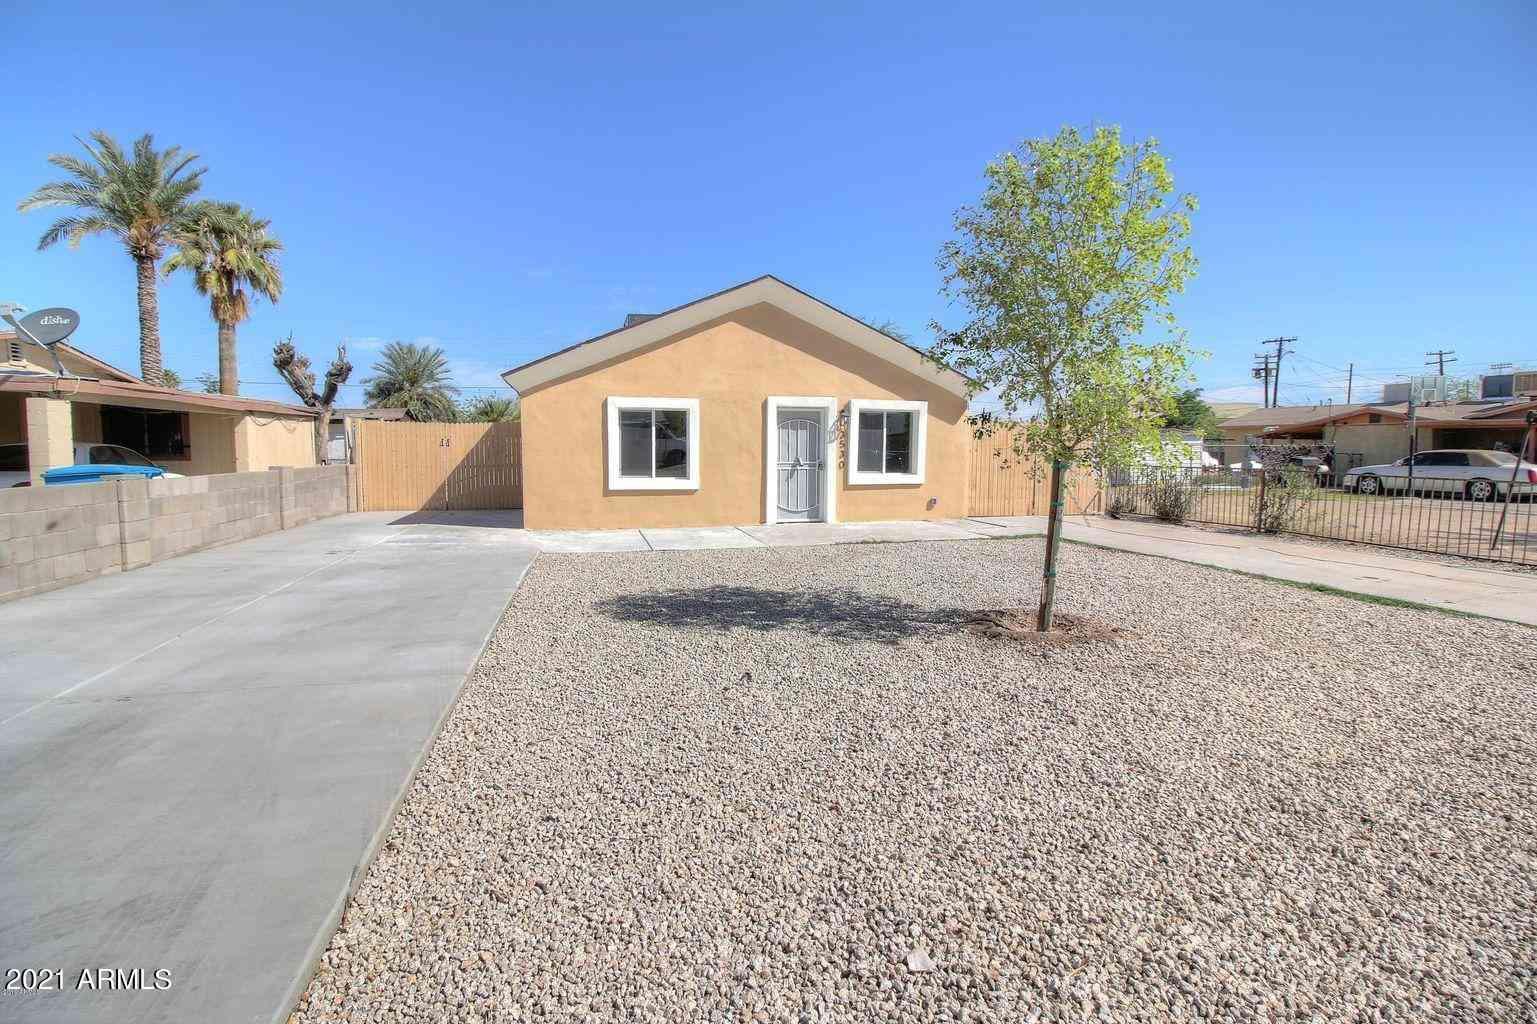 3530 W FILLMORE Street, Phoenix, AZ, 85009,